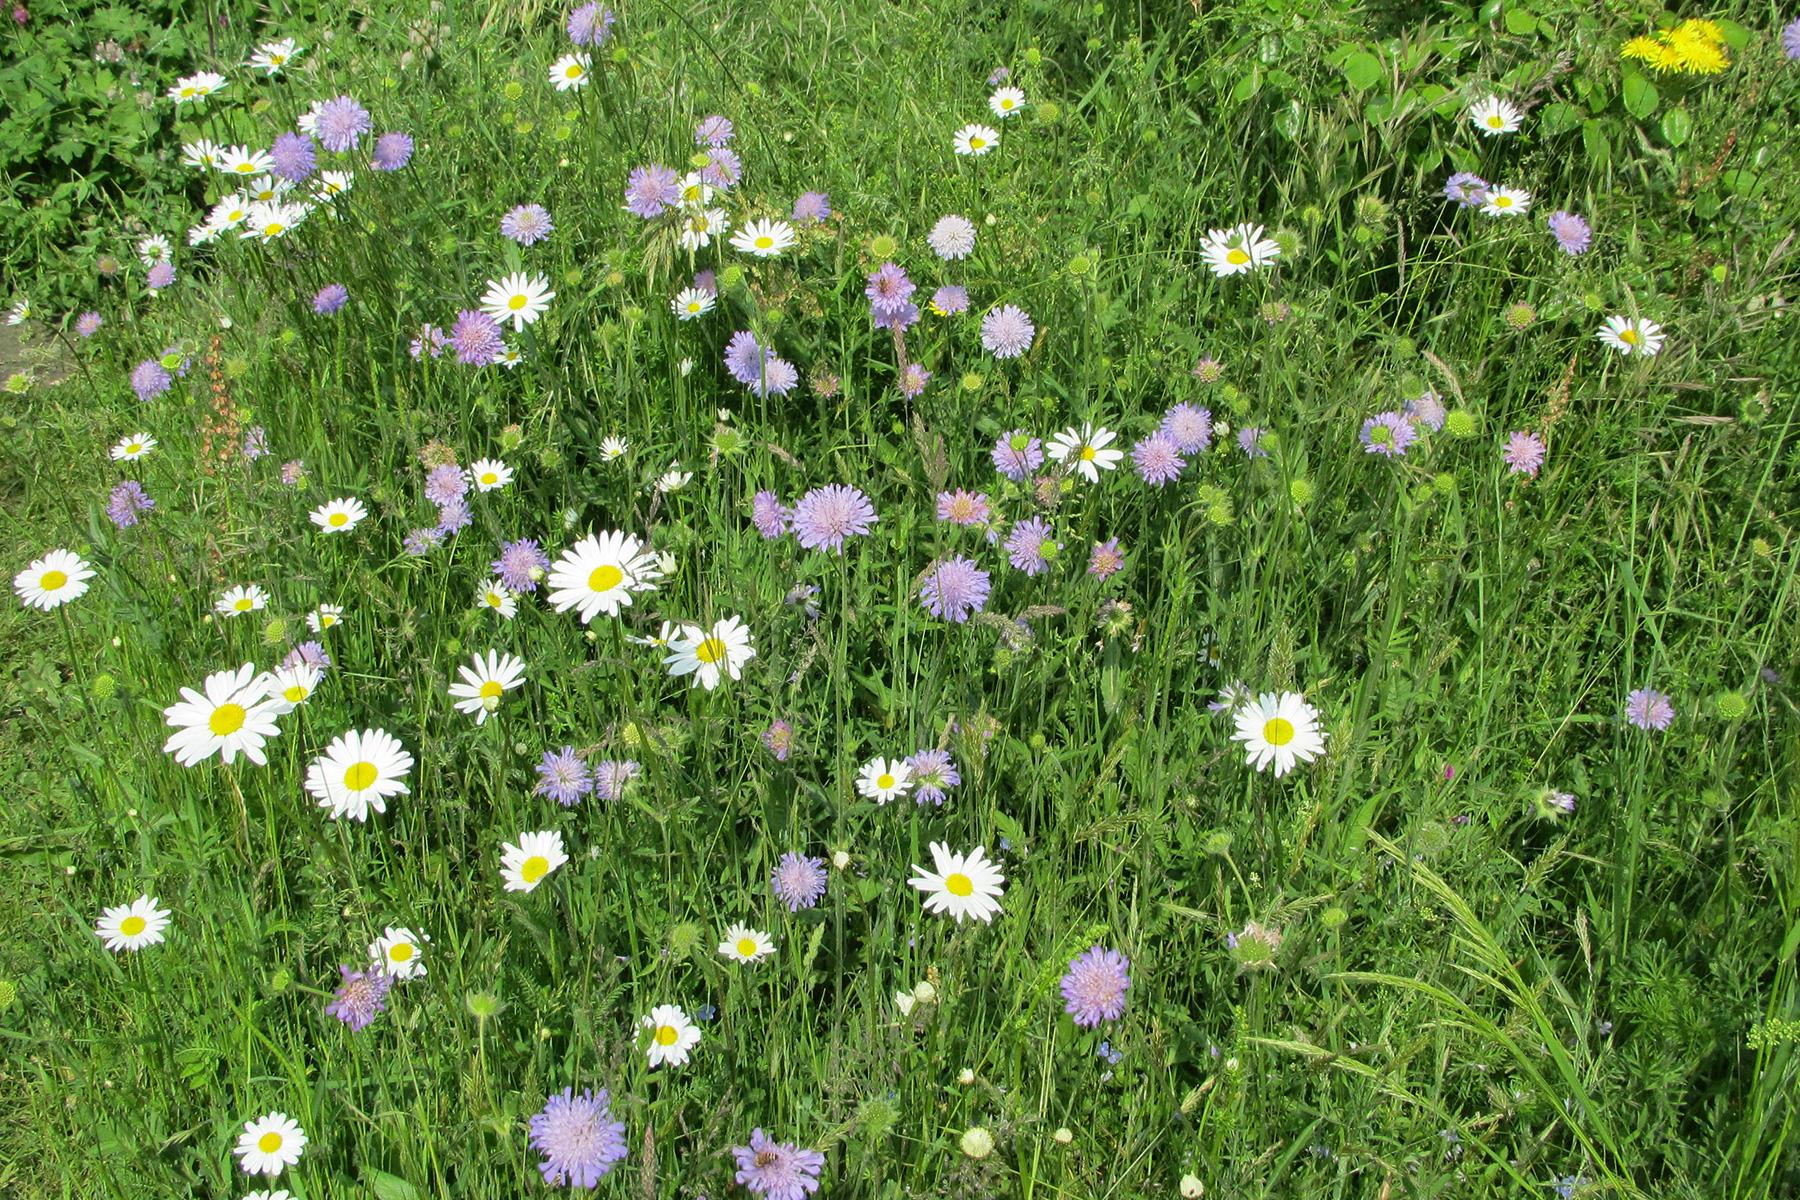 Gartenpflege Wojtkowski Blumenwiese